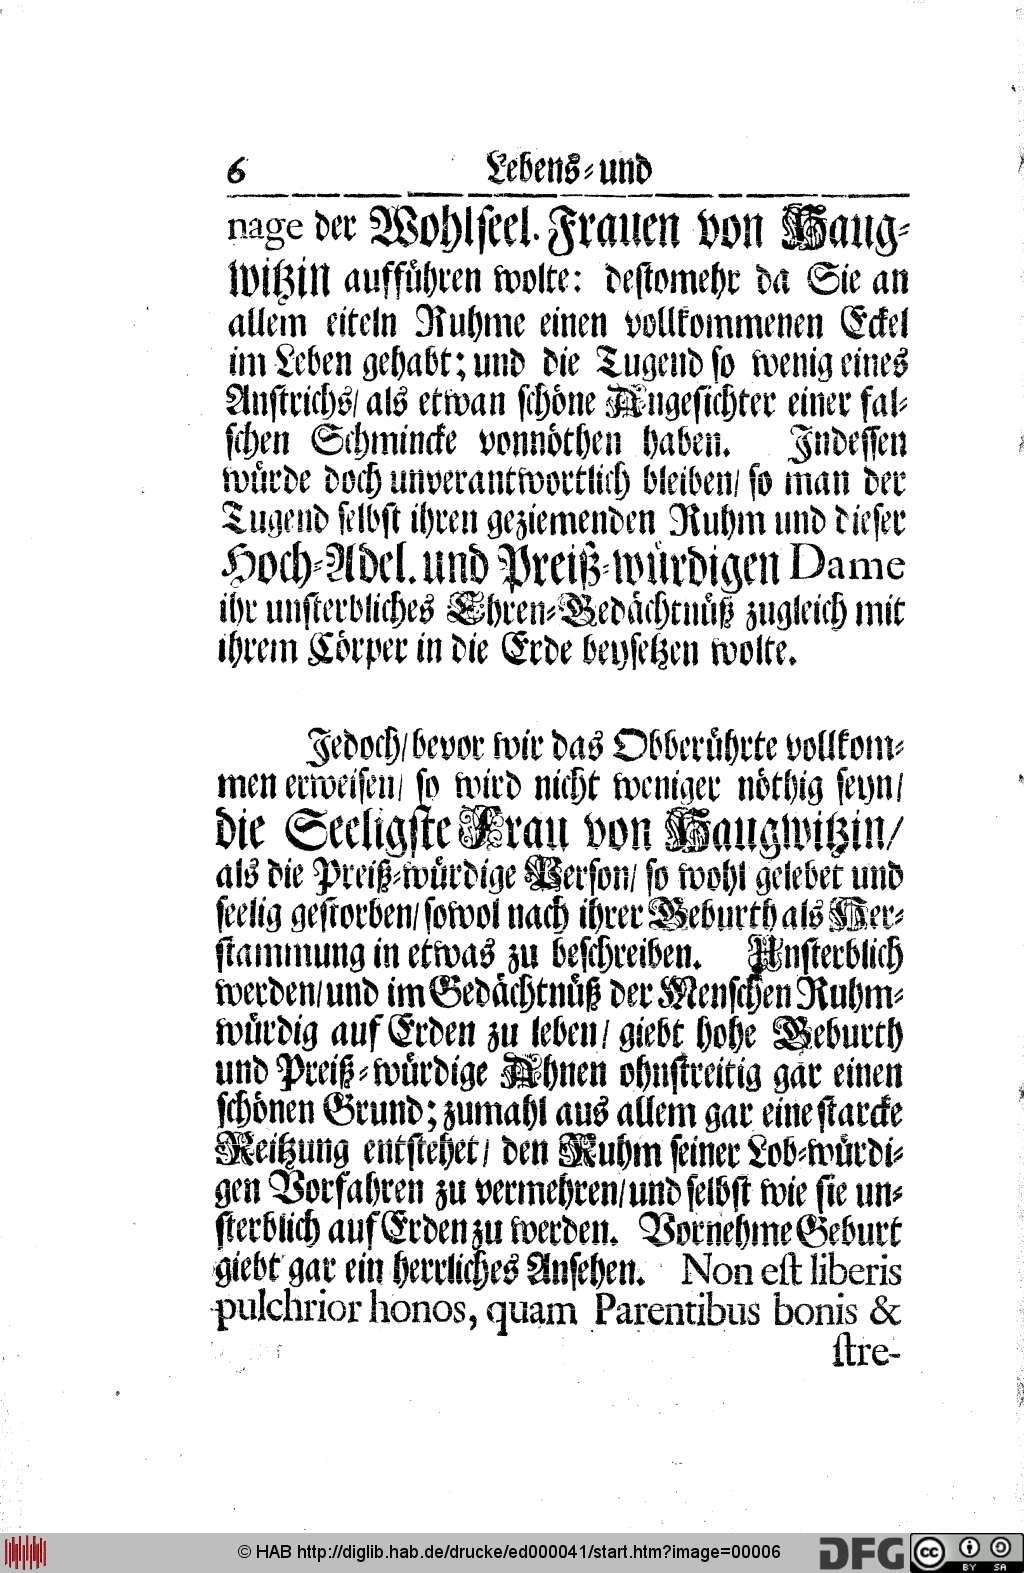 http://diglib.hab.de/drucke/ed000041/00006.jpg